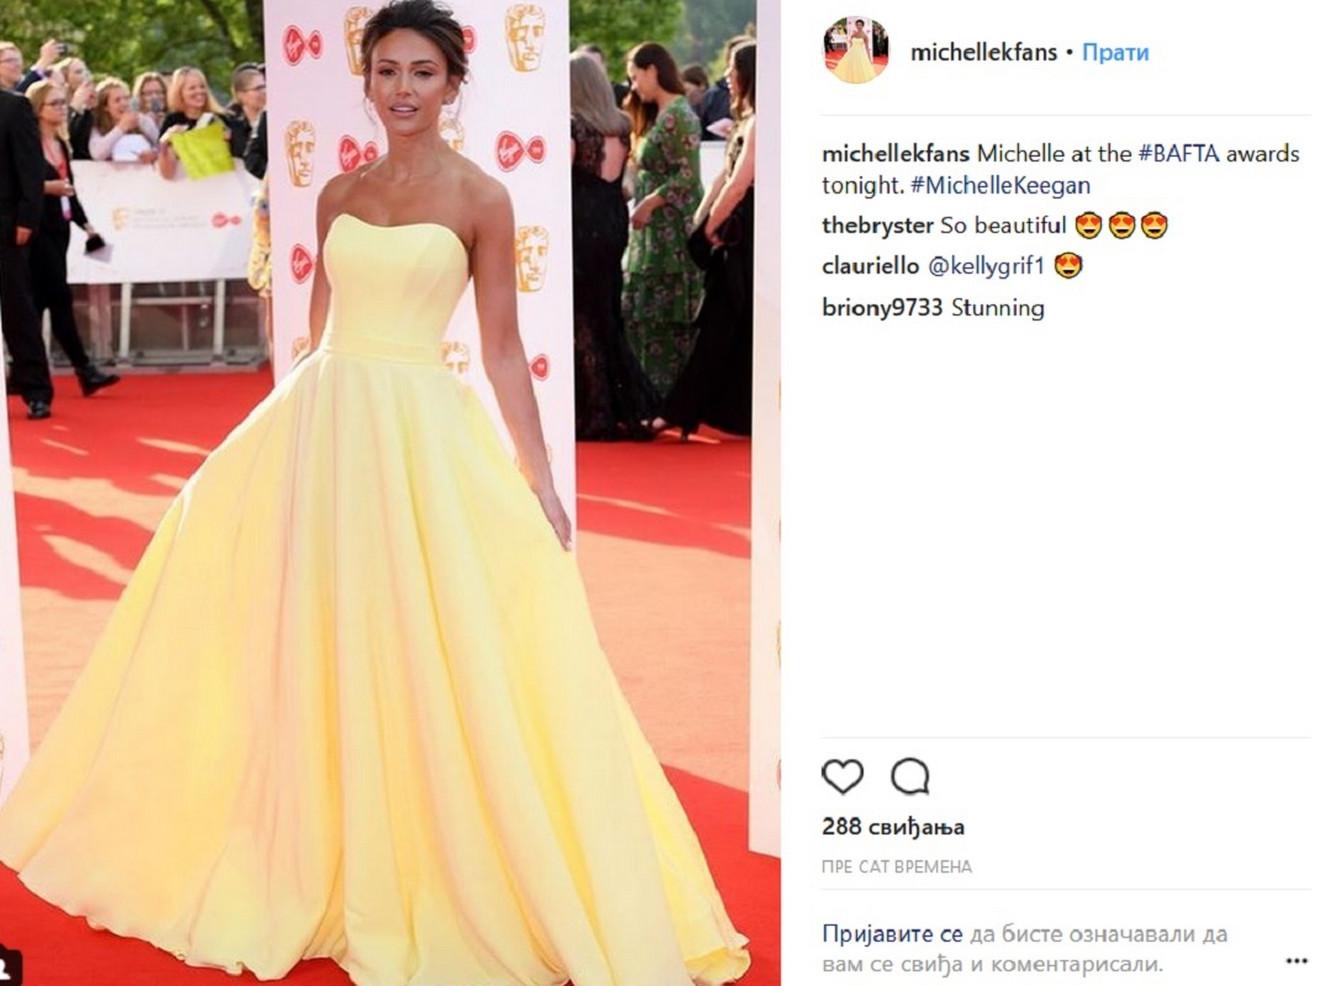 Mišel Kigan u žutoj haljini